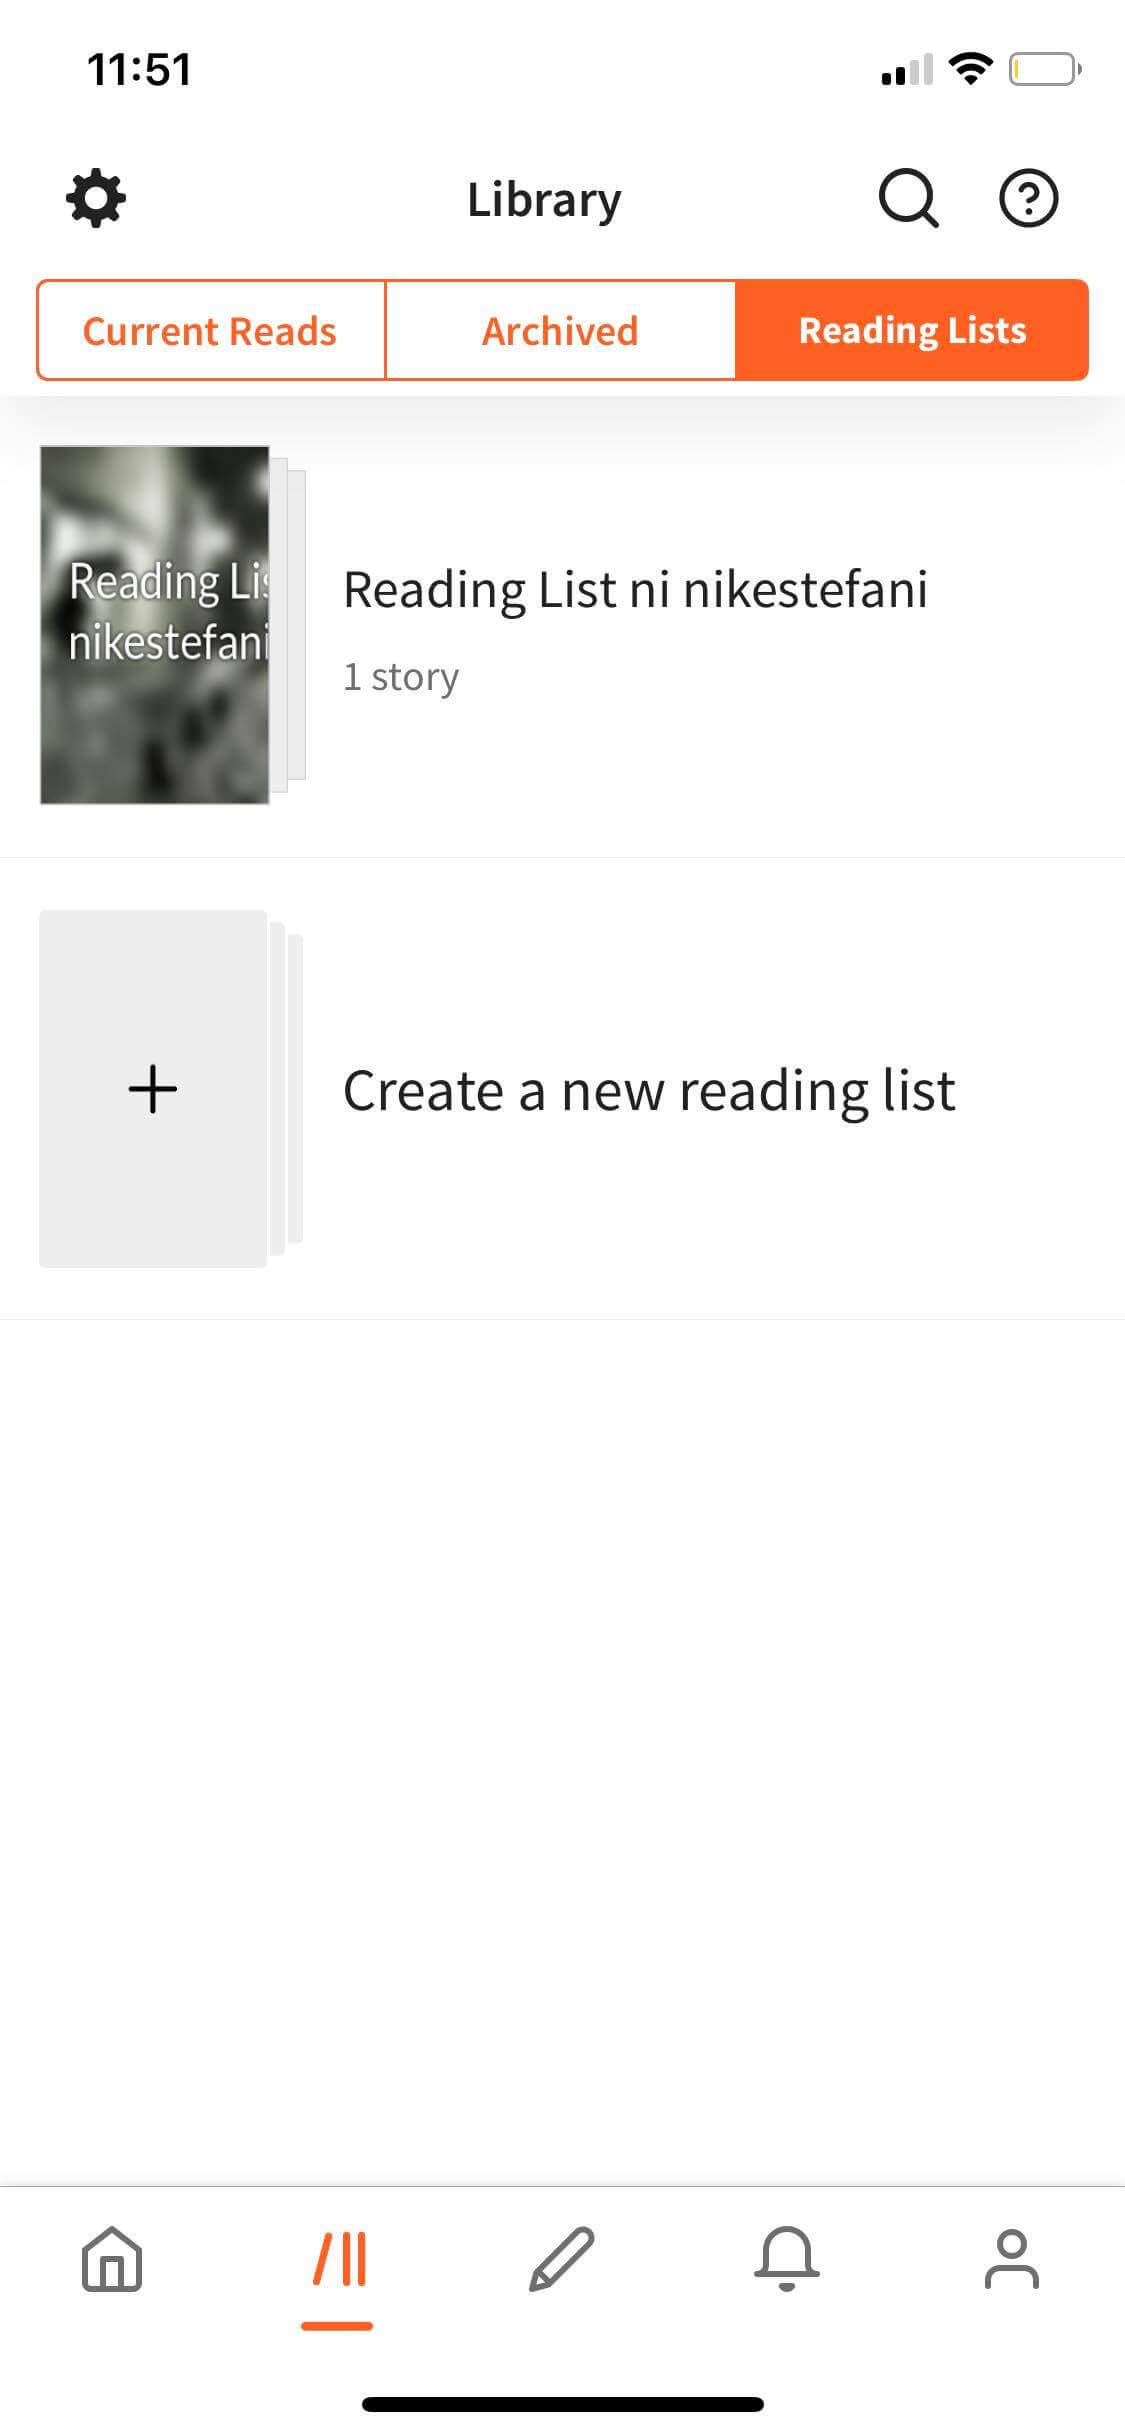 Walkthrough on iOS by Wattpad from UIGarage